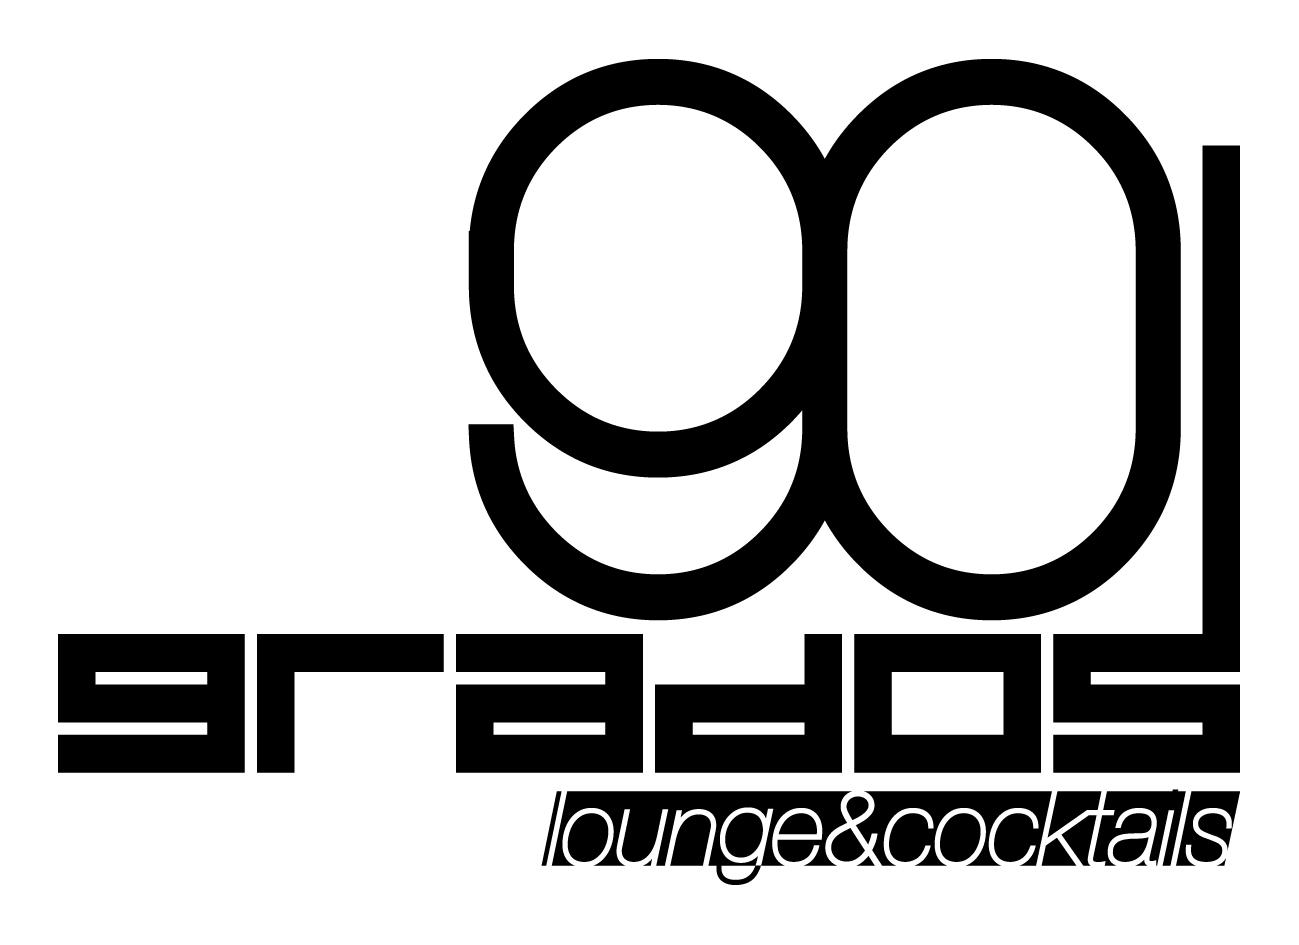 90 grados alcalde sainz de baranda 64 madrid for Cocinar a 90 grados